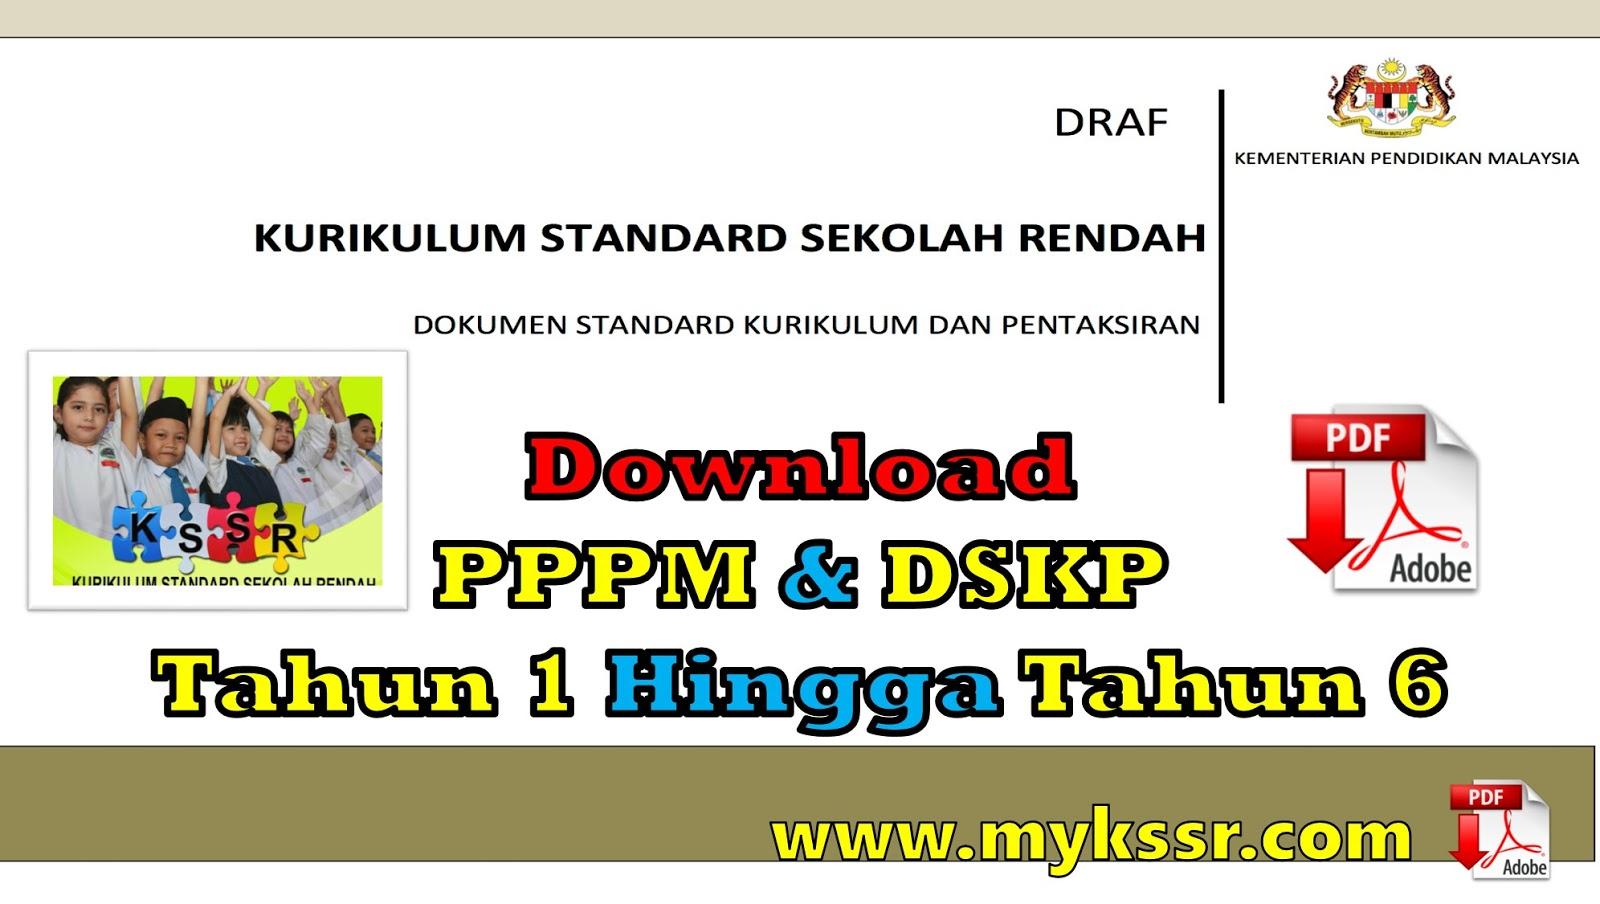 Download Pppm Dskp Tahun 1 Hingga Tahun 6 Mykssr Com